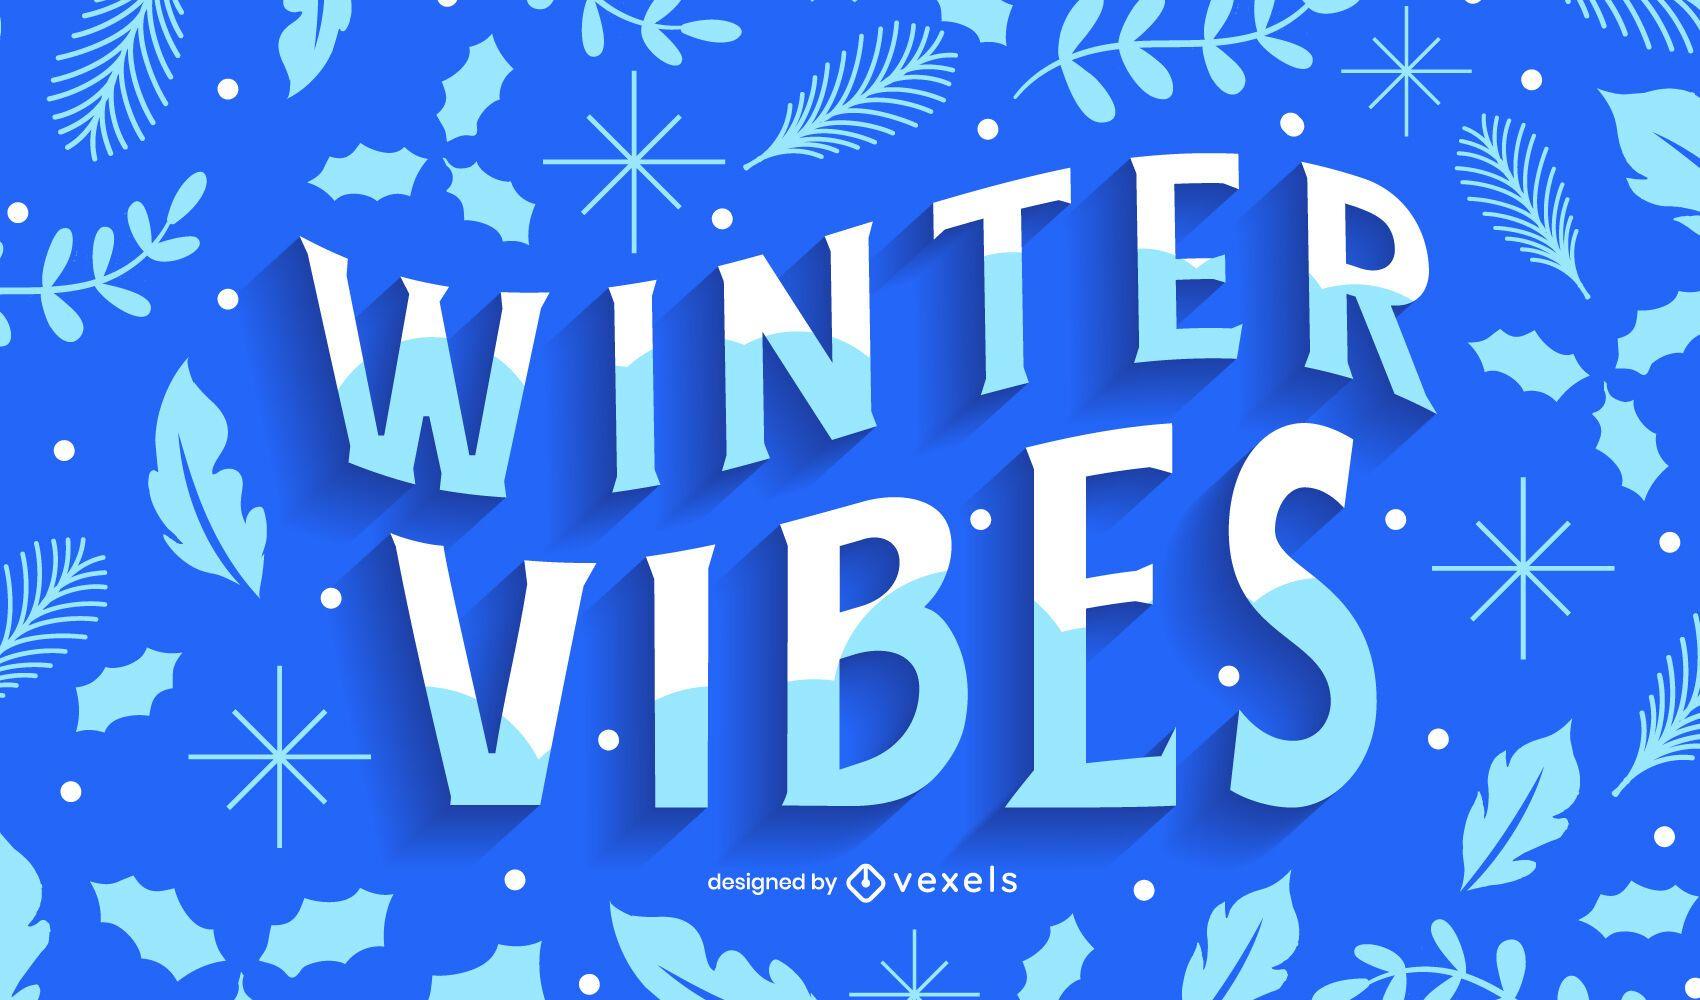 Winter vibes lettering design